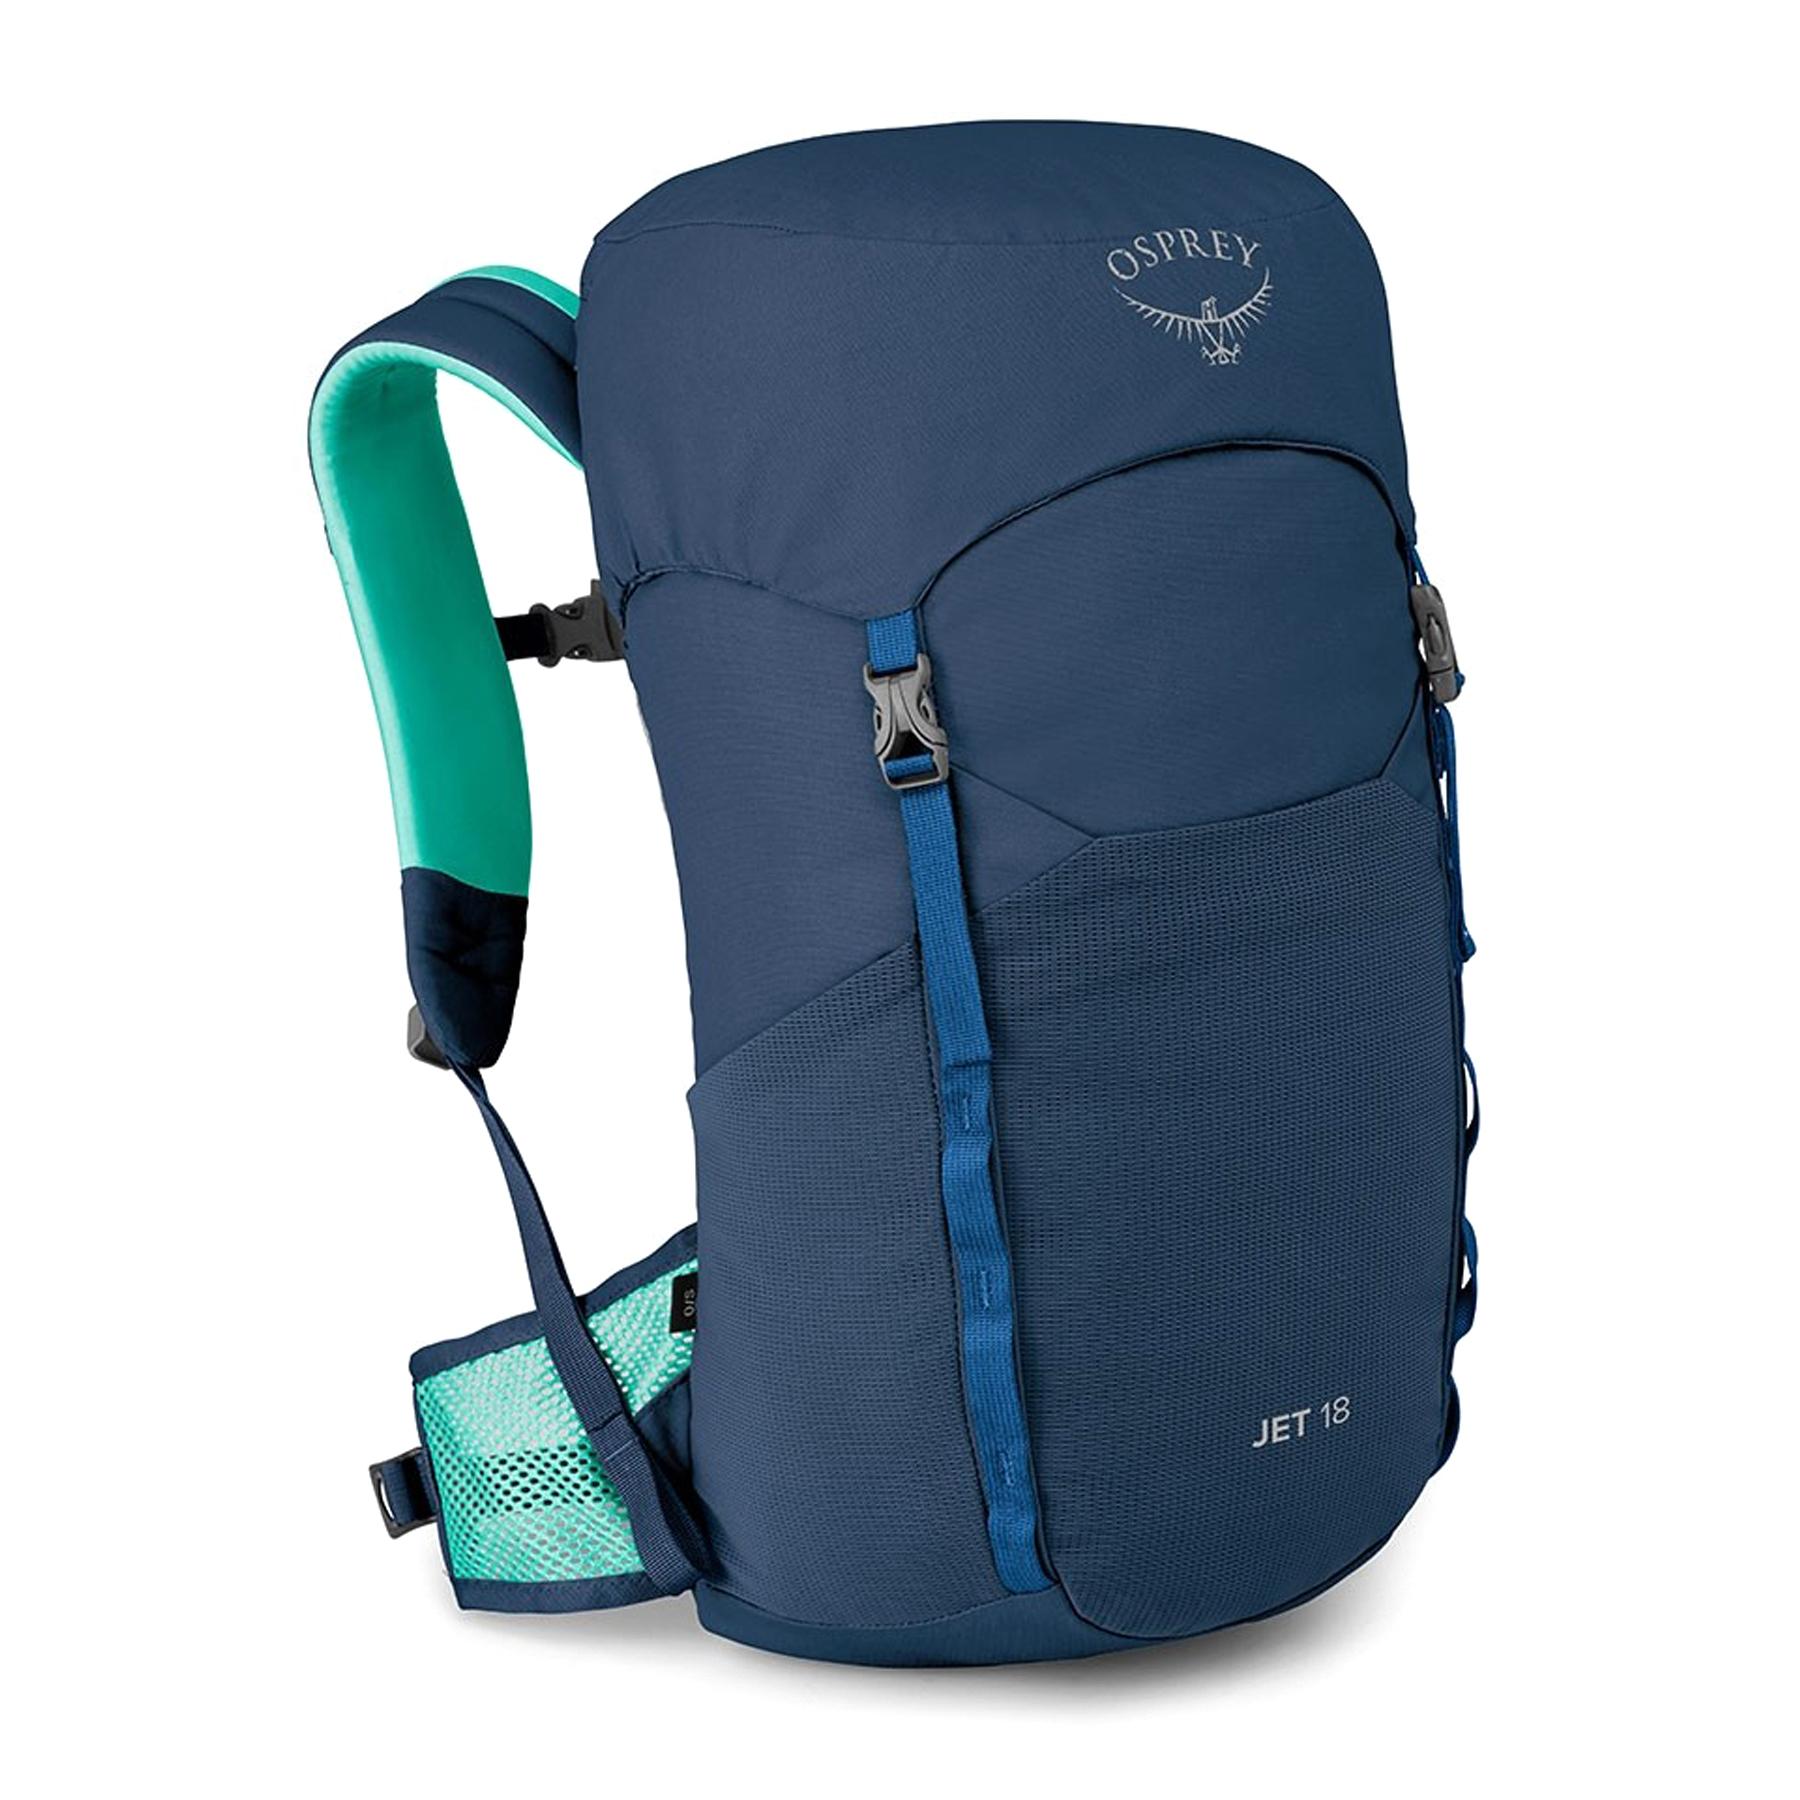 Boys Backpacks & Rucksacks | Free Delivery* at Surfdome